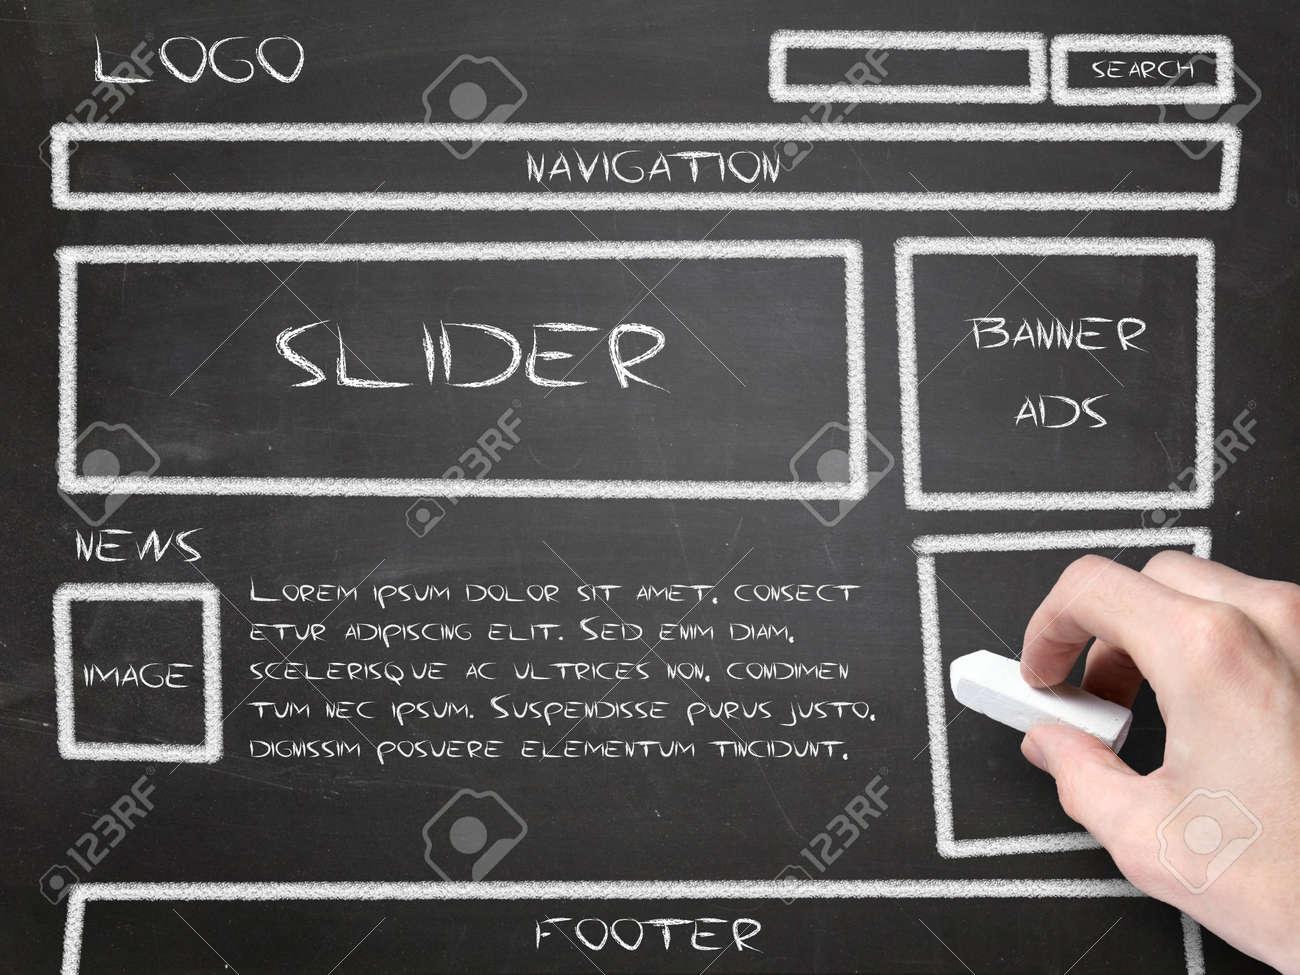 finest website planning website wireframe sketch on blackboard with room  planning website